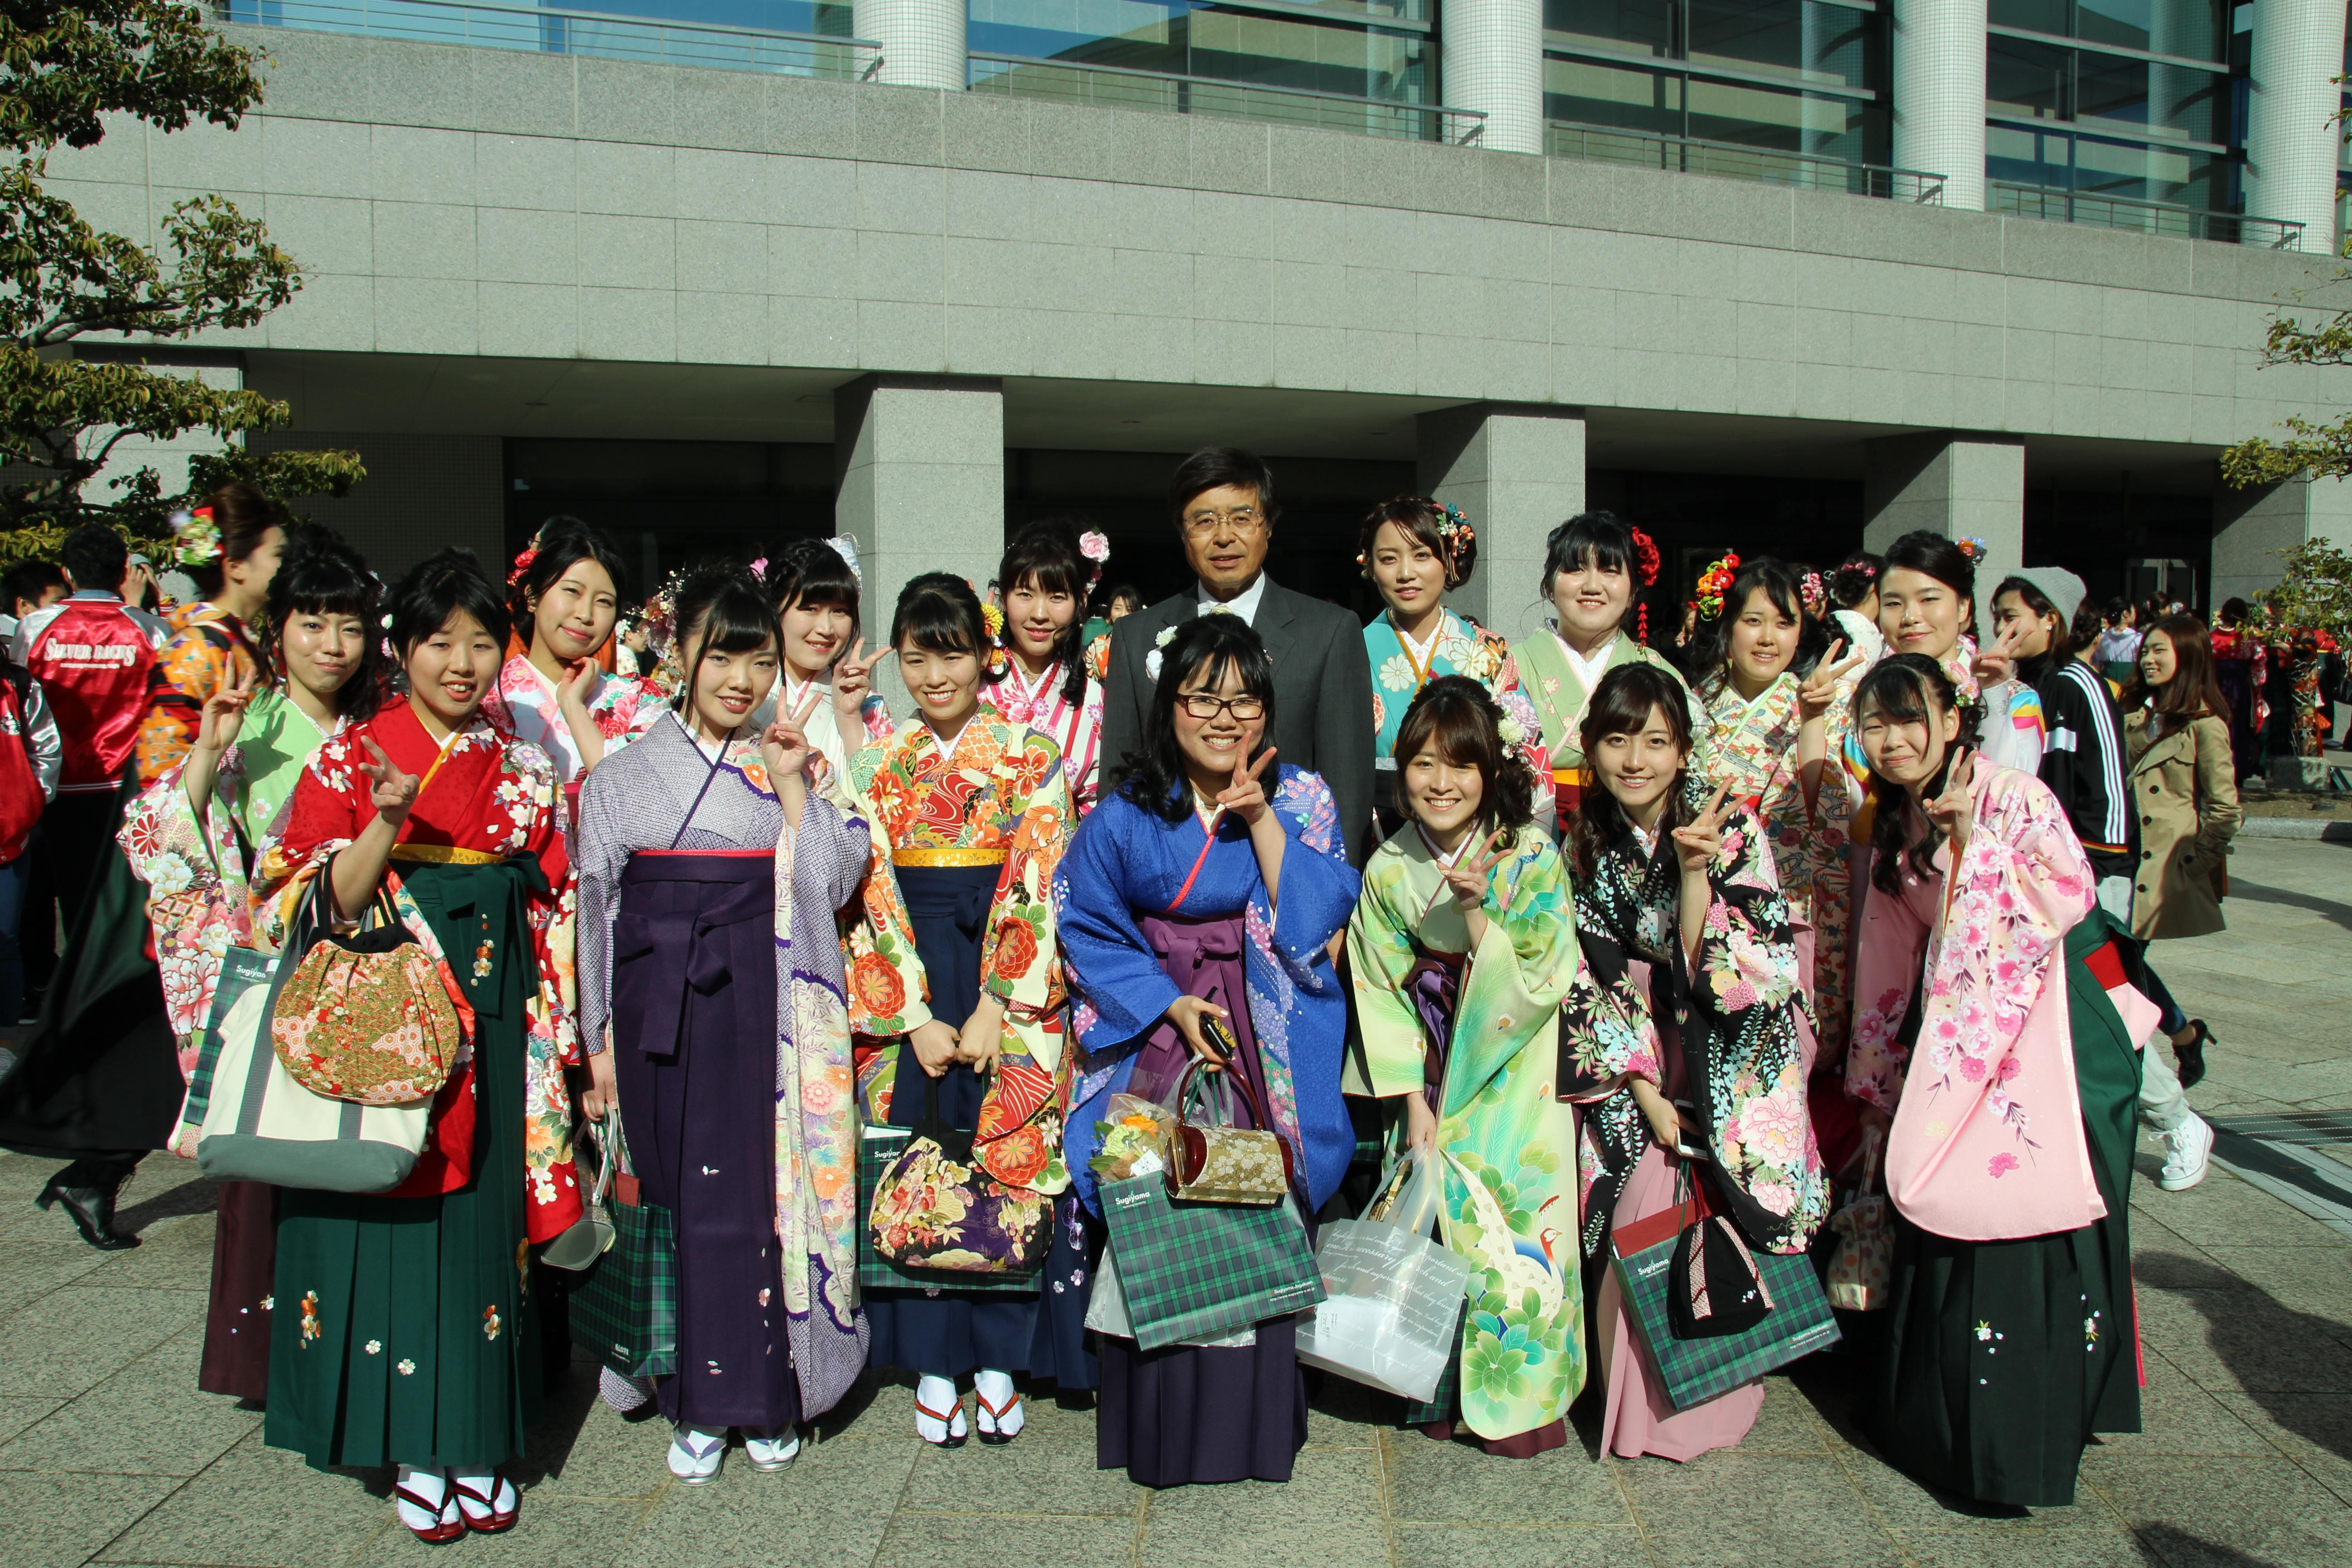 http://tochikubo.ci.sugiyama-u.ac.jp/report/assets/images/IMG_7999.JPG